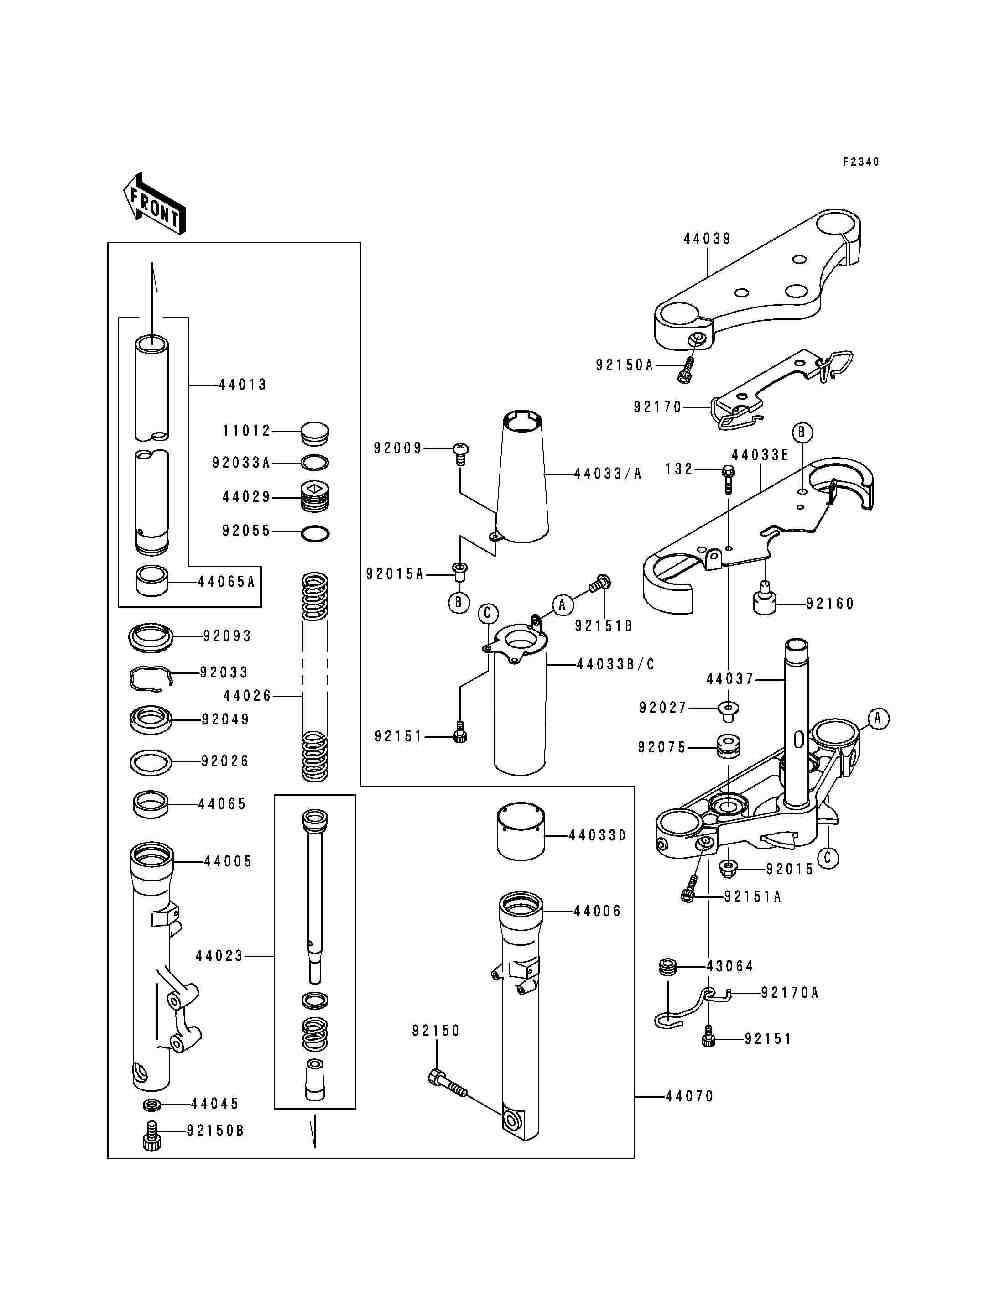 Kawasaki Mule 610 Wiring Diagram. Kawasaki. Wiring Diagram